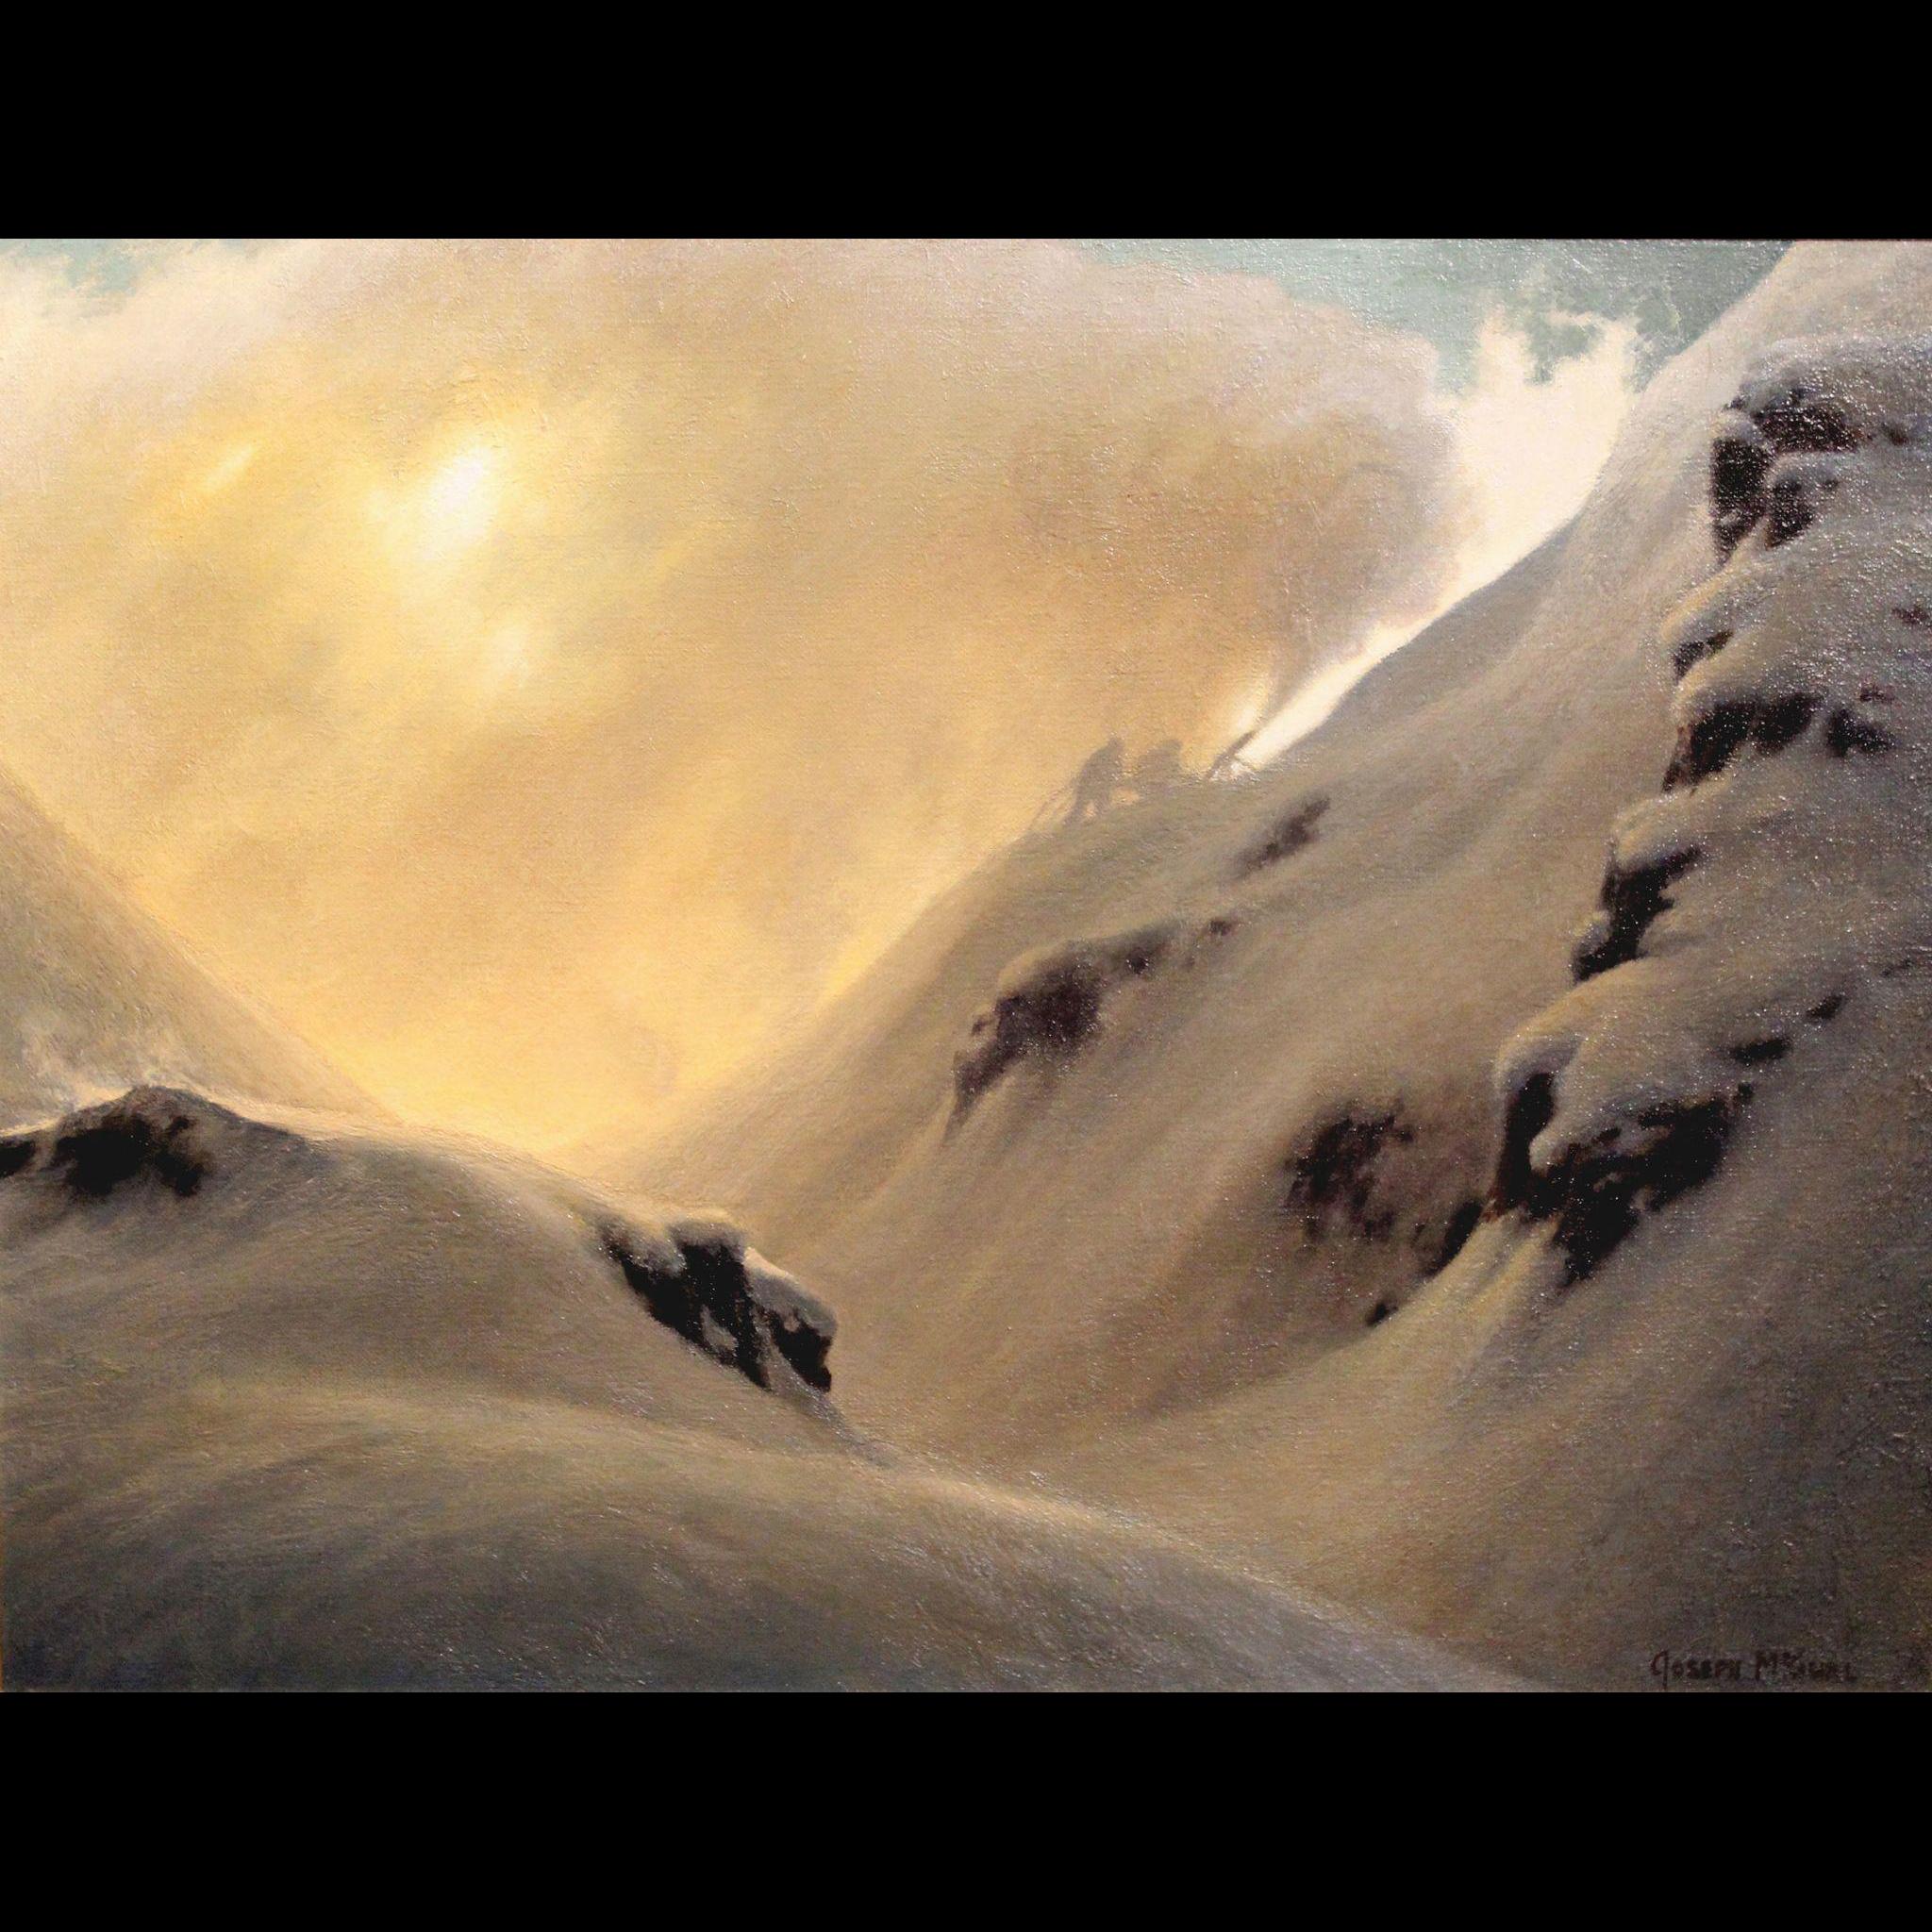 Joseph McGurl Mountainscape Oil Painting - The Snowmakers